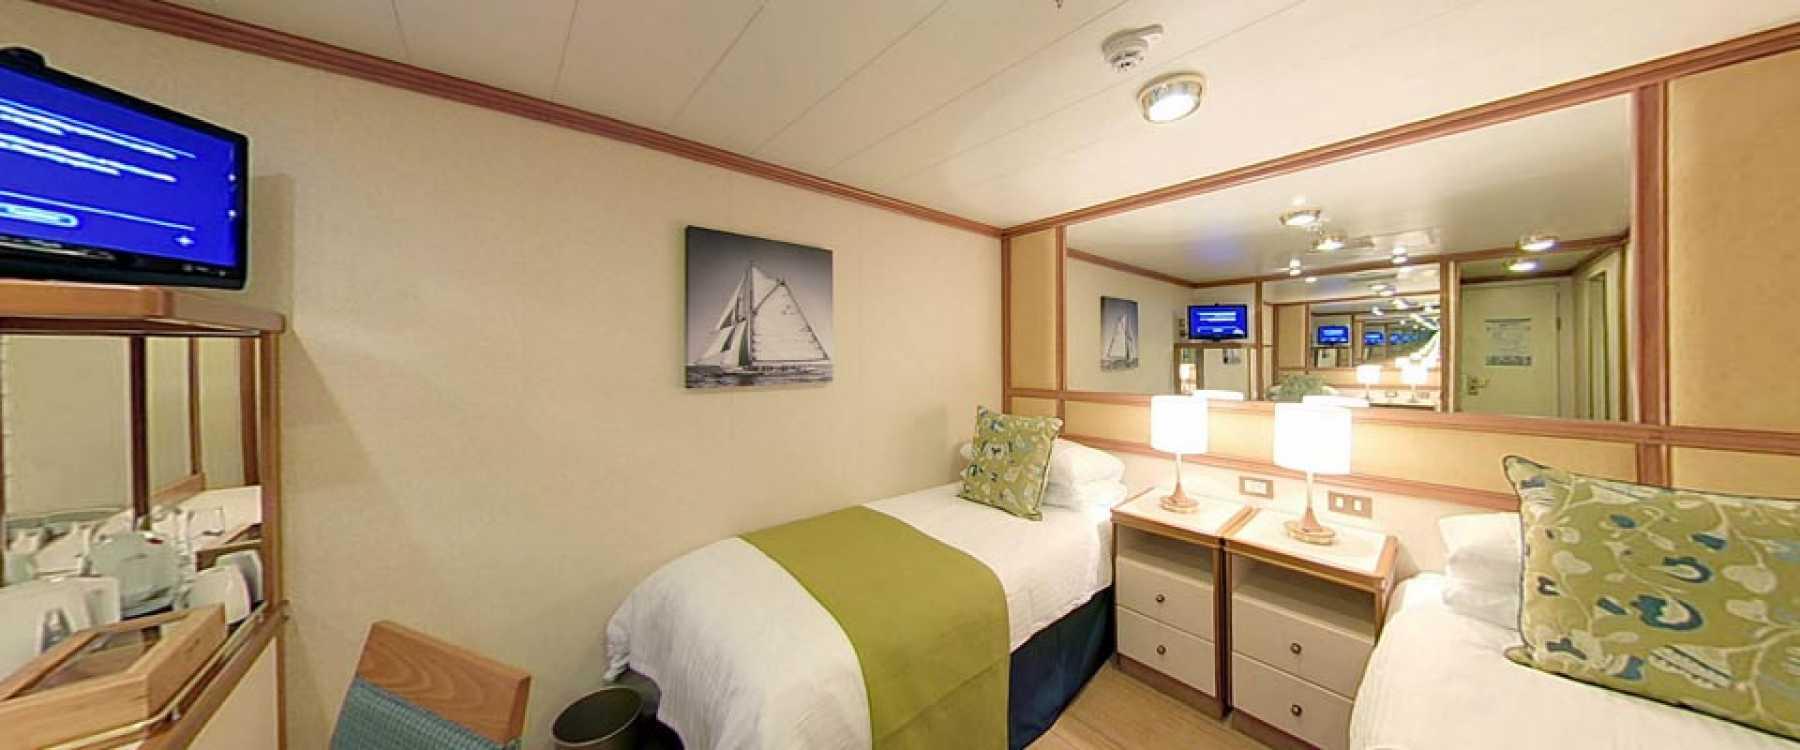 P&O Cruises Azura Accommodation Inside Cabin.jpg